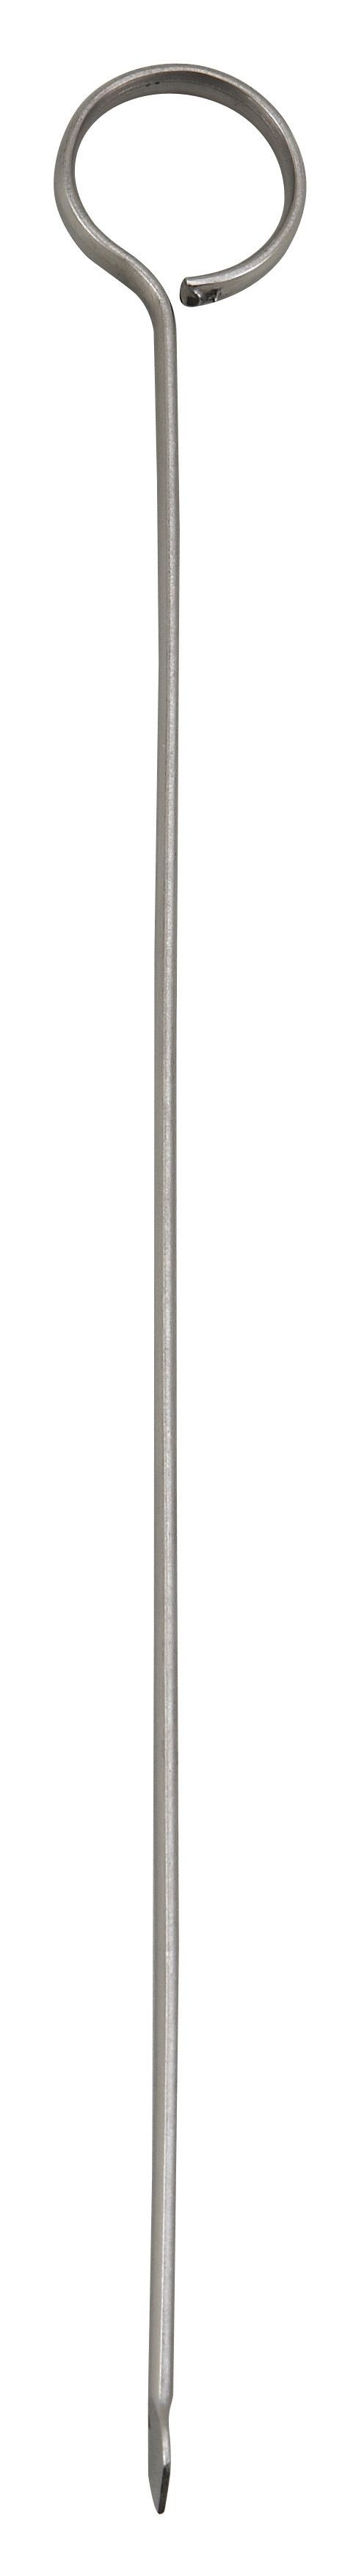 "Winco SKO-10 Oval-Tipped Stainless Steel Skewer 10"""